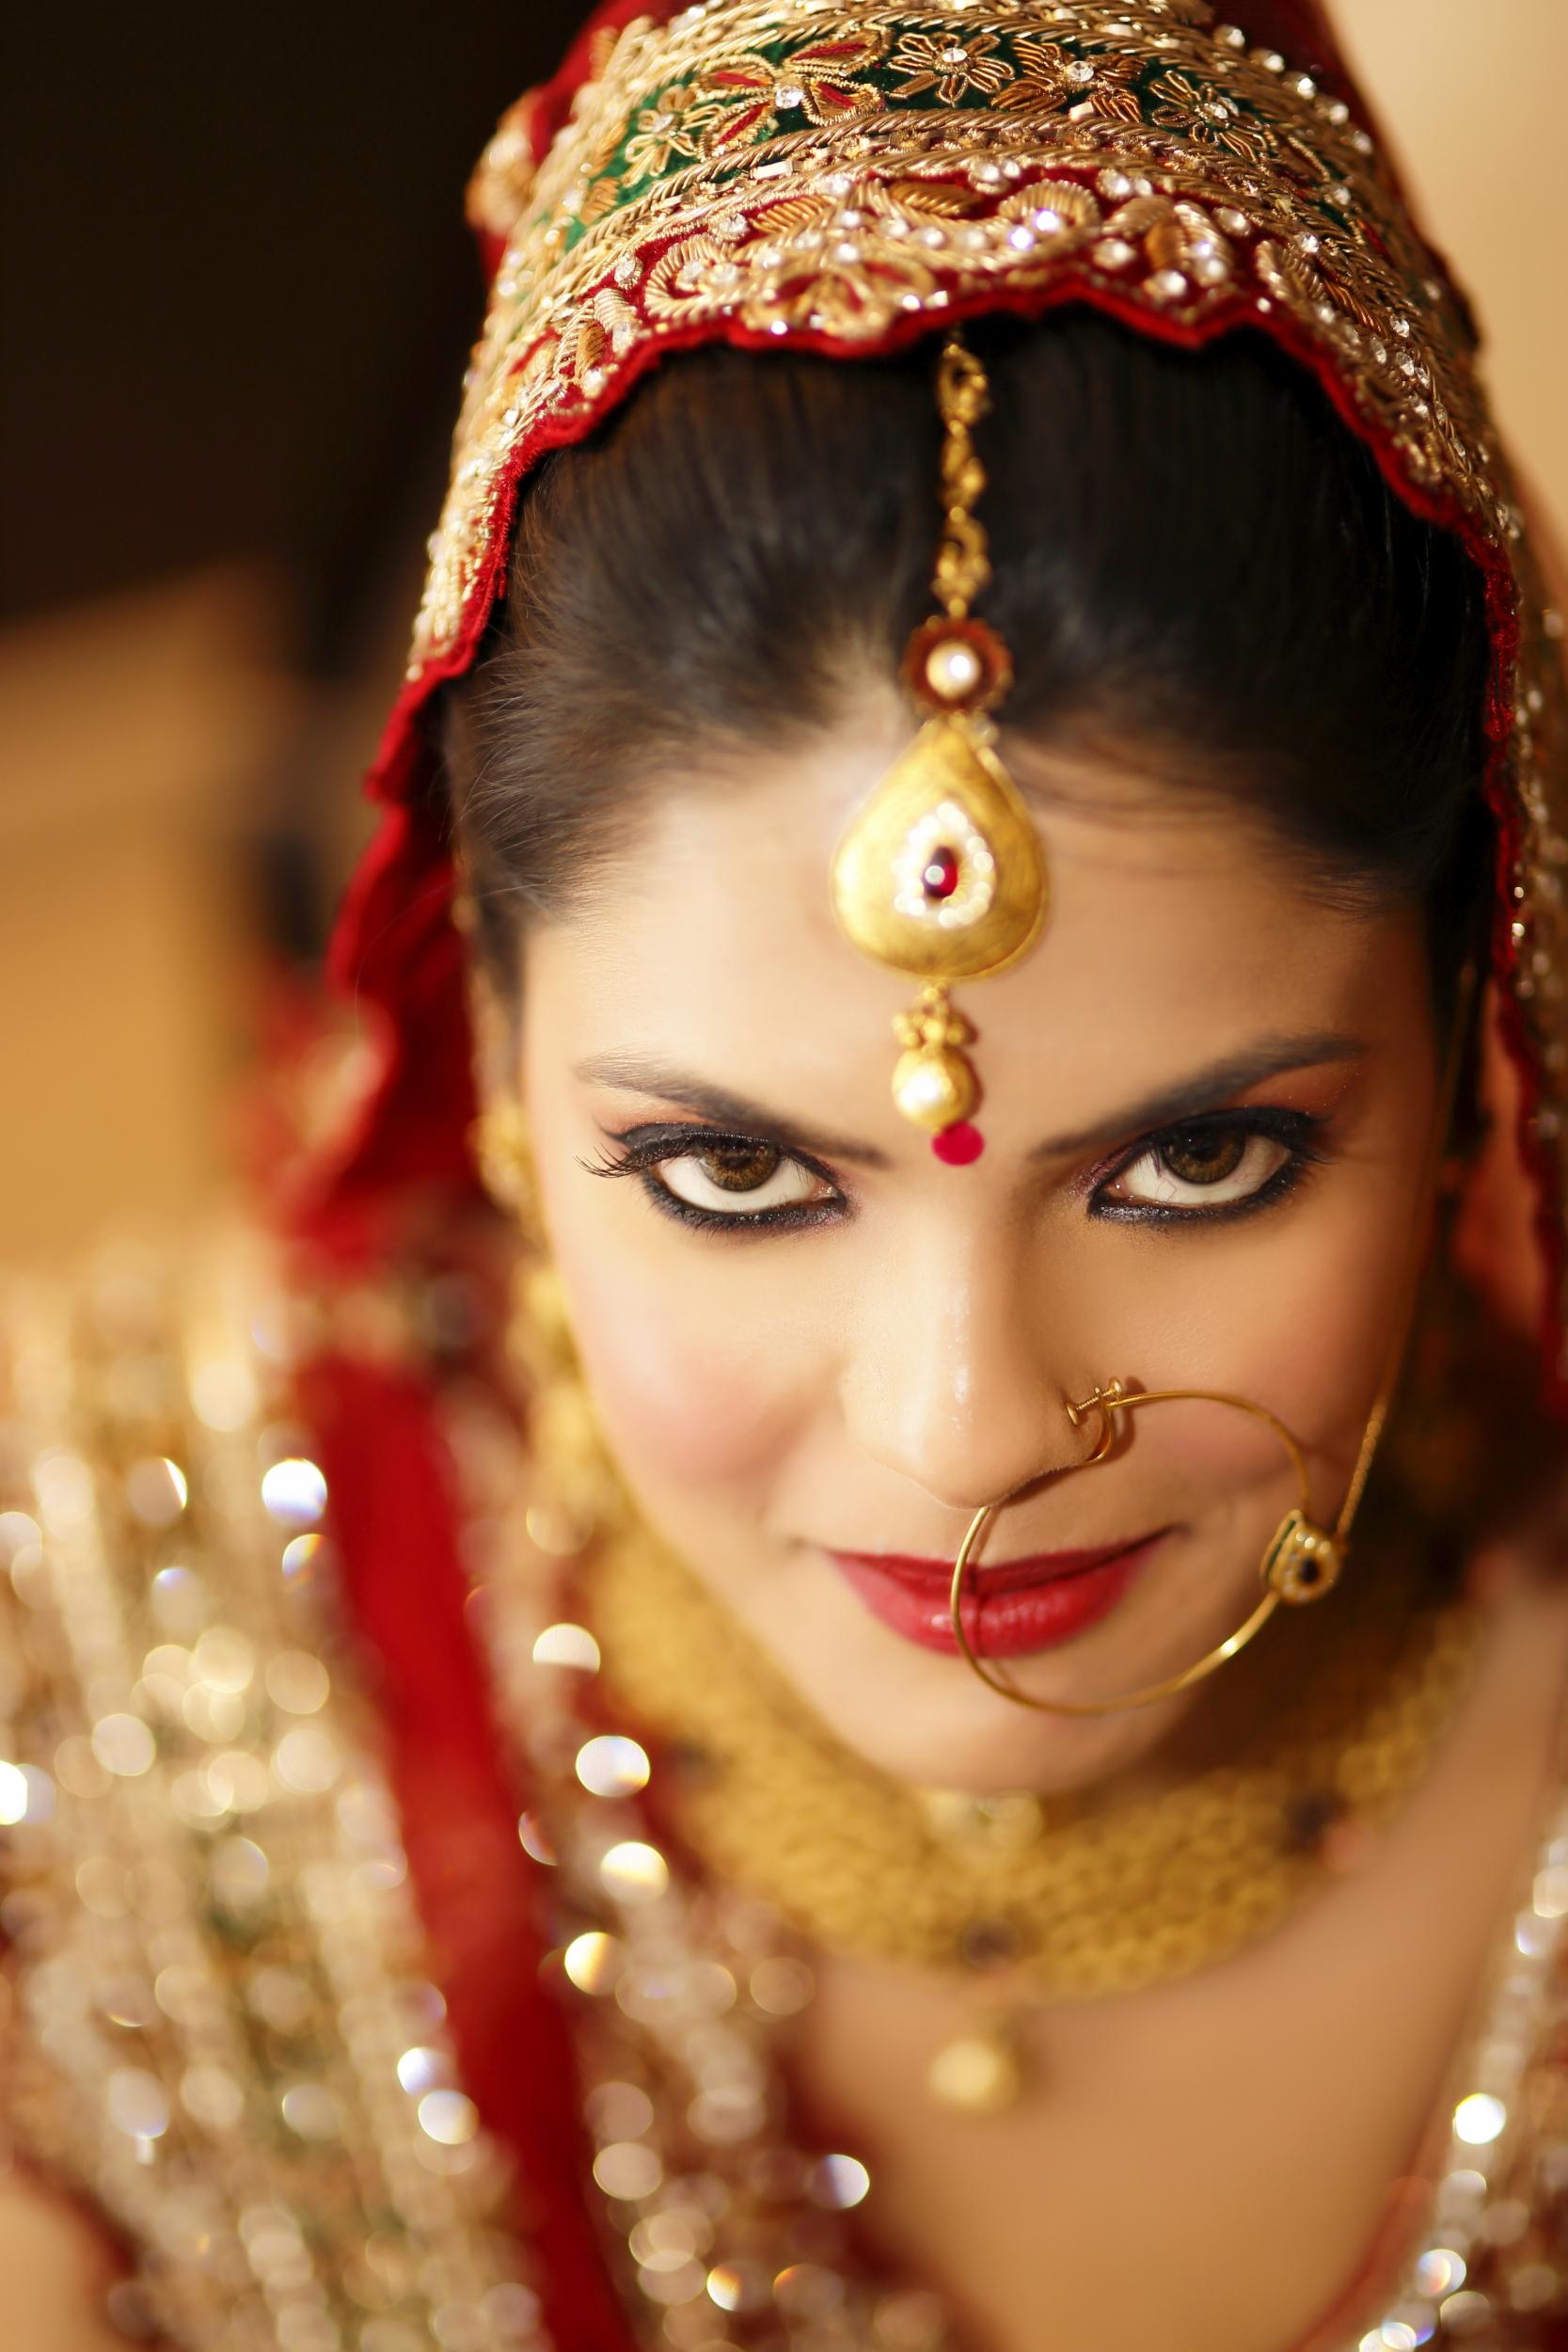 Best candid wedding -10 TWR Photographer Delhi NCR